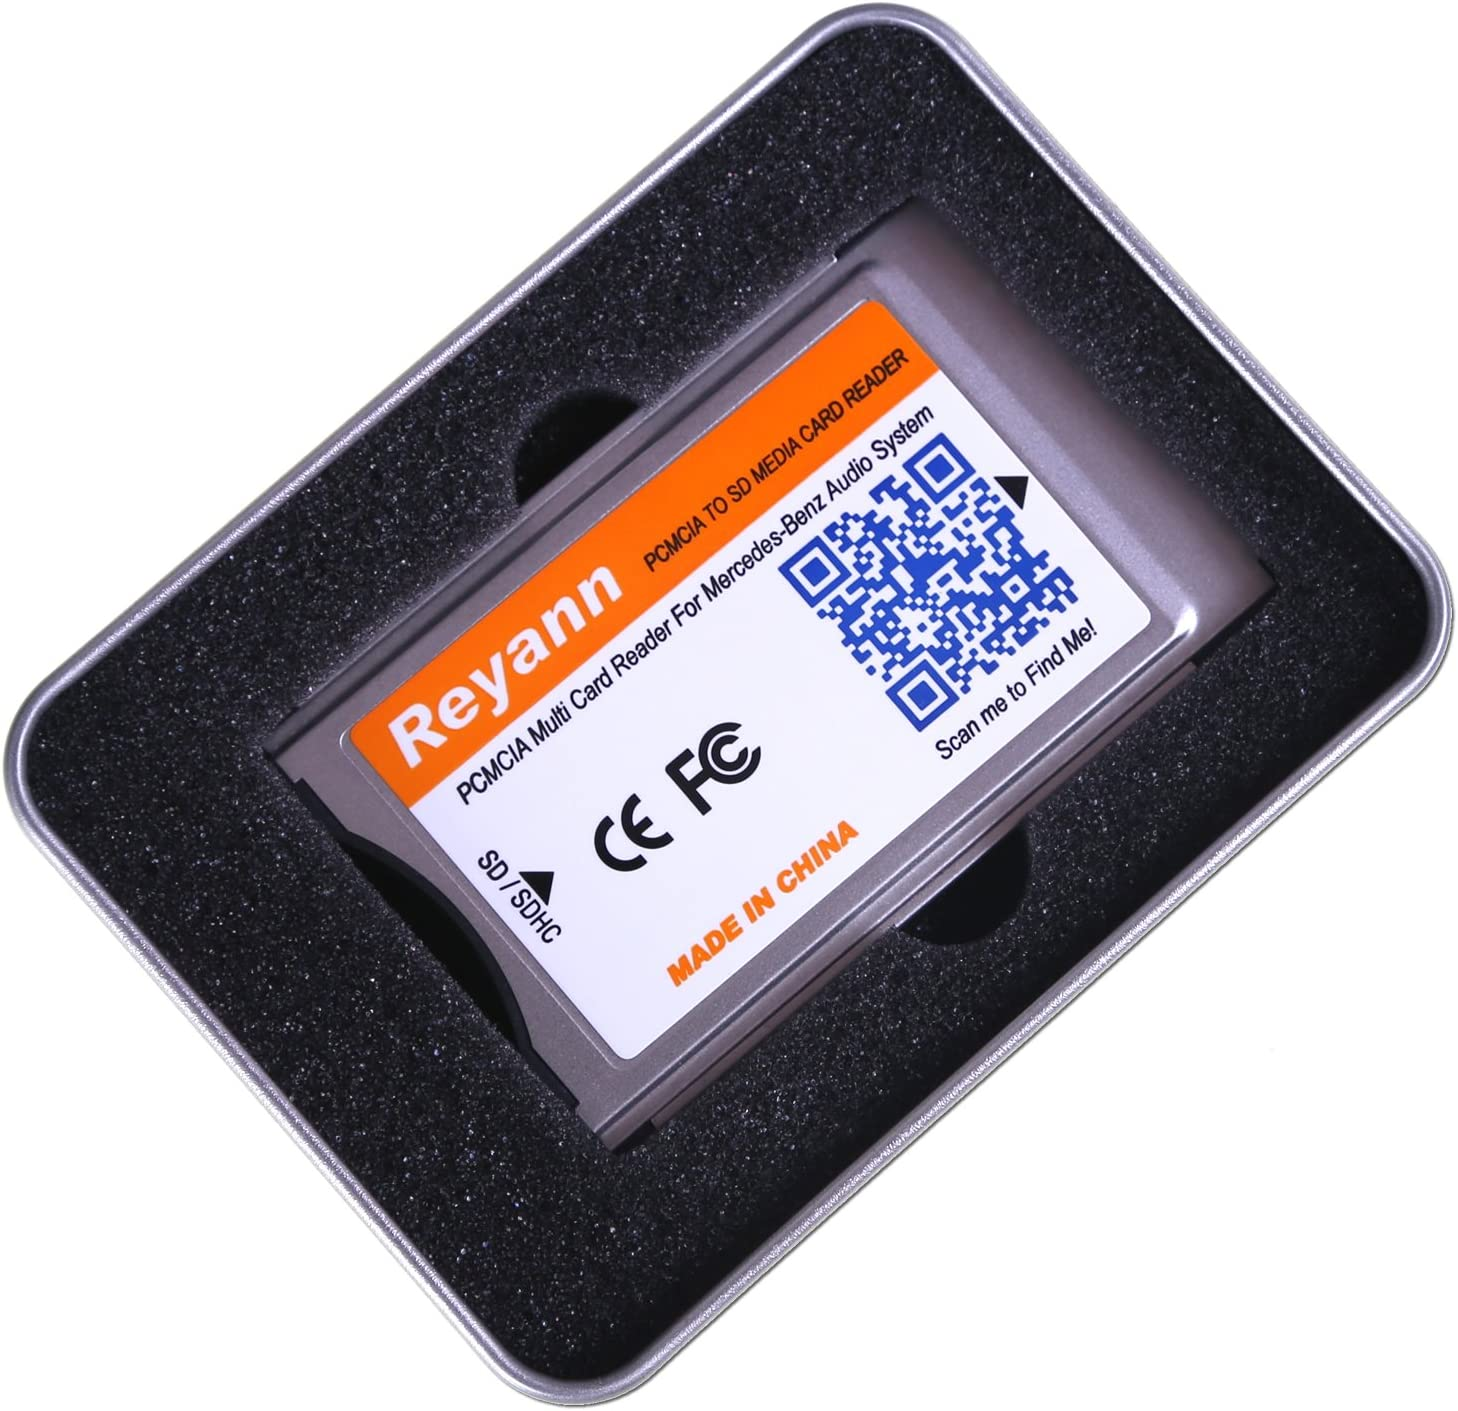 Hikig Adaptateur PCMCIA vers carte SD Mercedes-Benz Comand APS C197 W212 W204 W221 W207 avec slot PCMCIA Support max Carte SDHC 32 Go